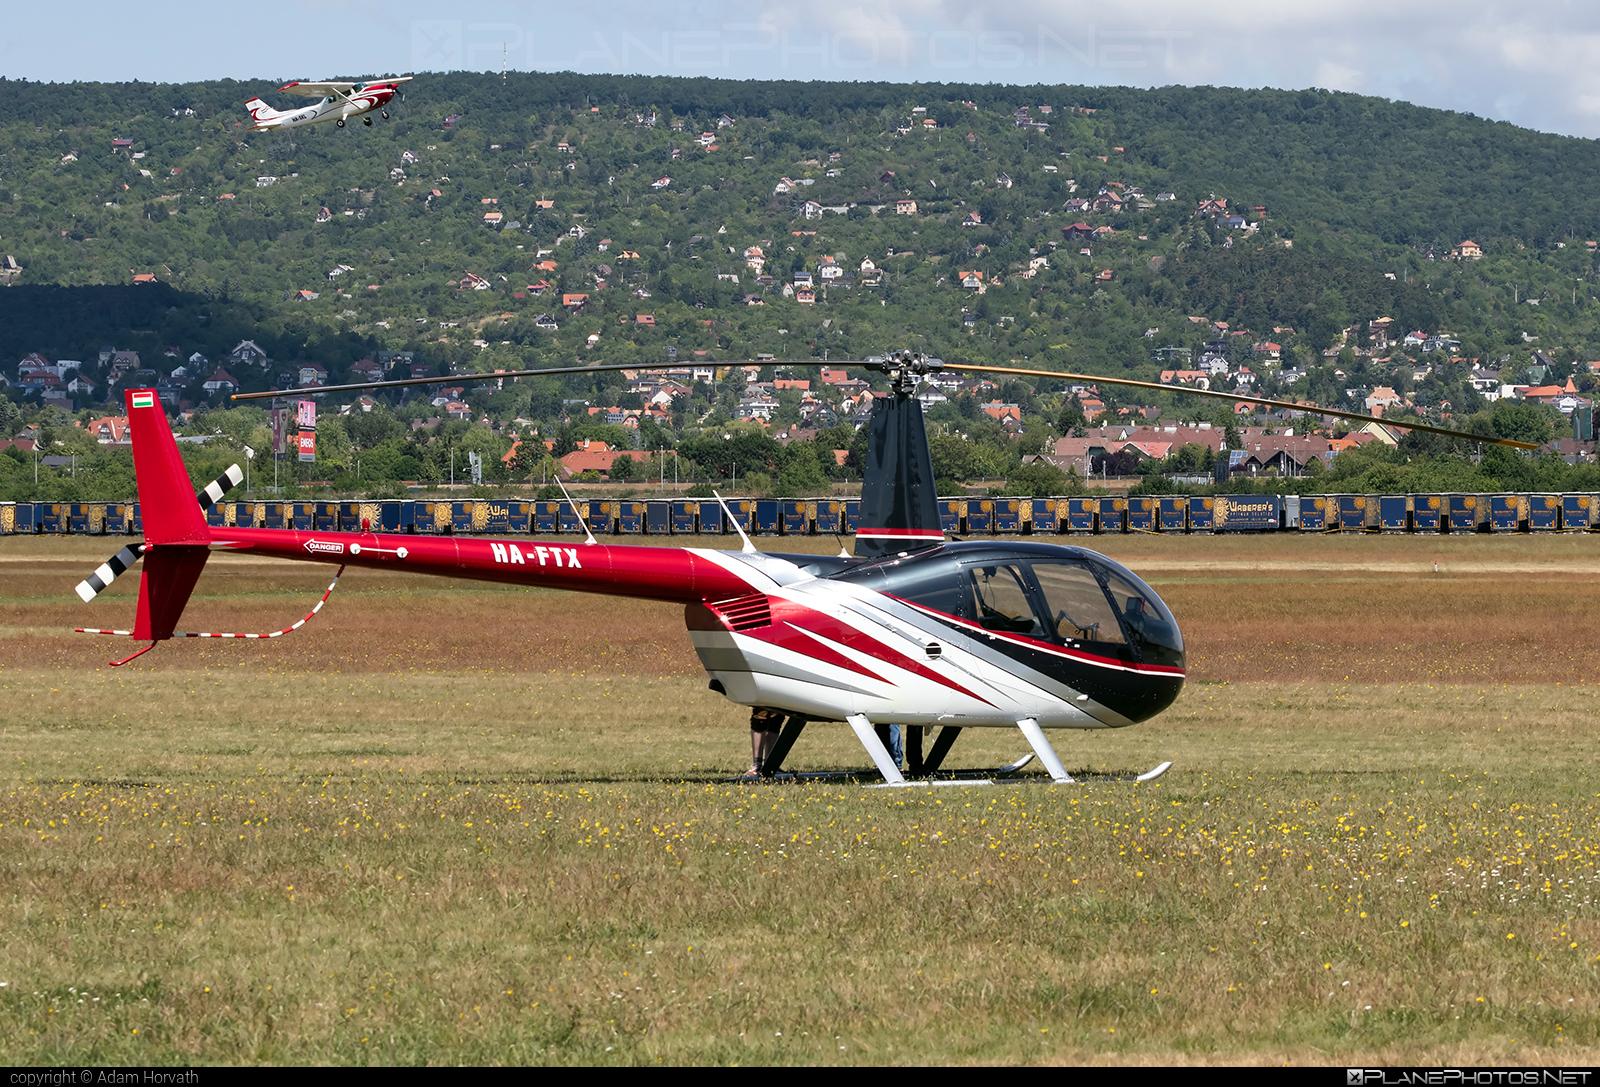 Robinson R44 Raven II - HA-FTX operated by BHS Hungary Kft. #bhshungary #robinson